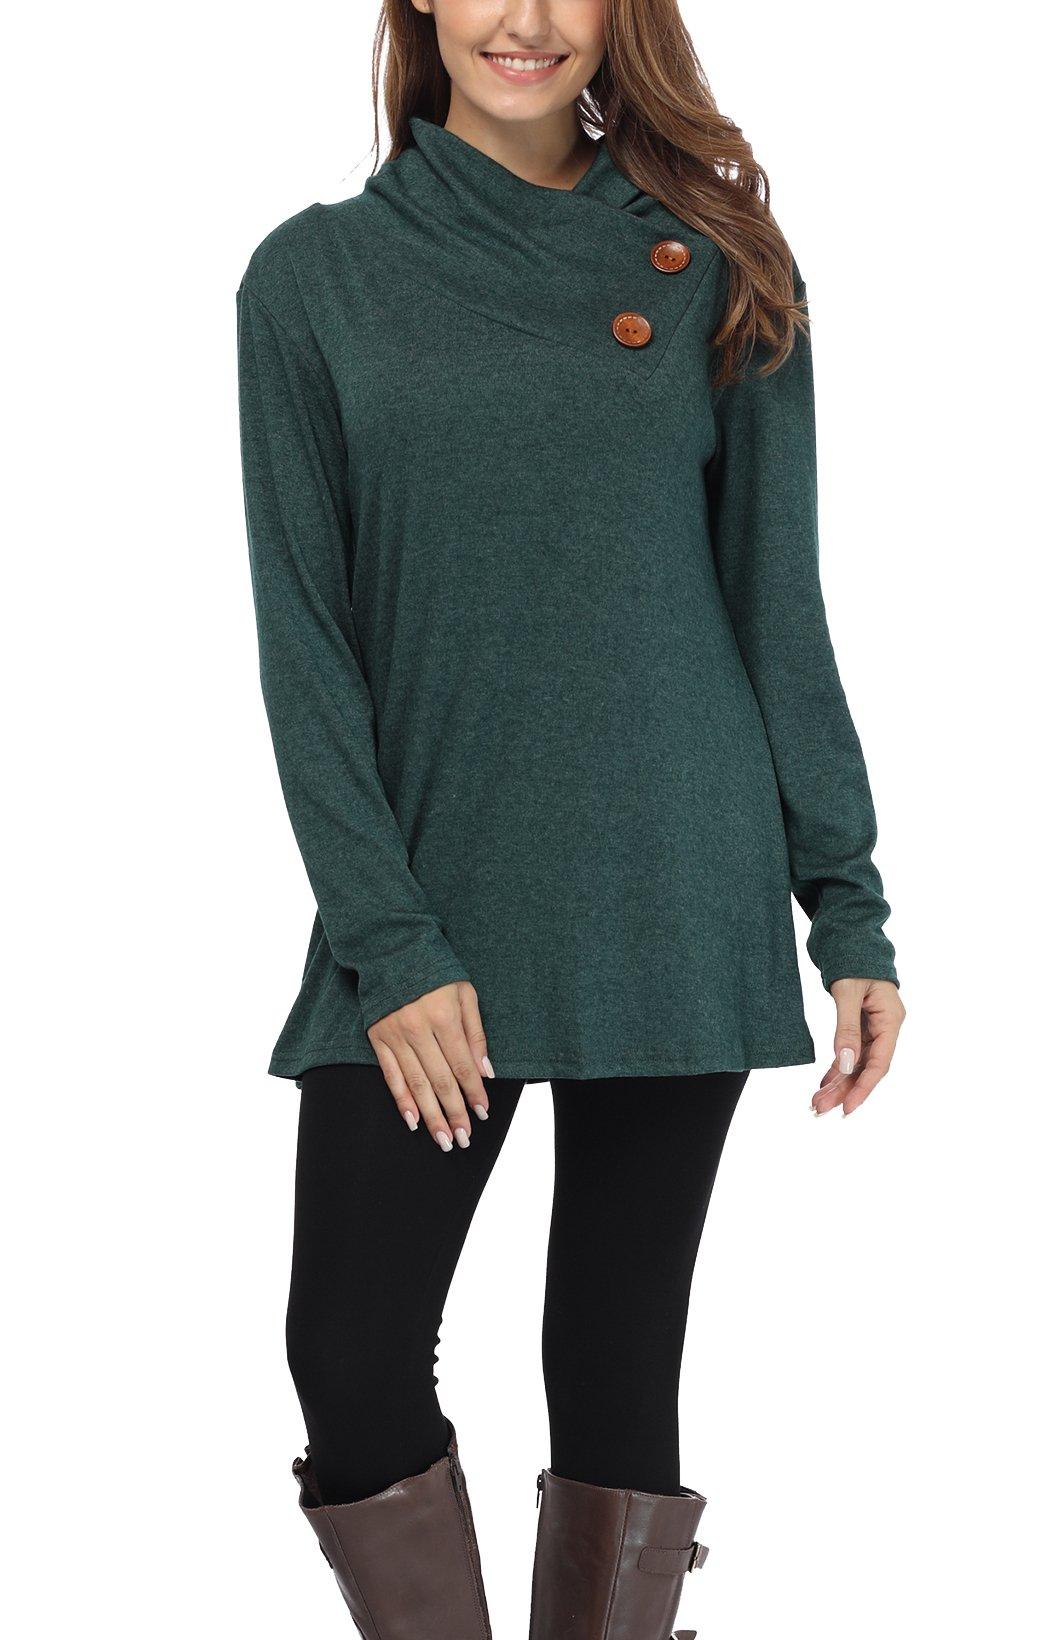 iGENJUN Women's Long Sleeve Lapel Neck Button Design Loose fit Casual Basic Tops,Green,M